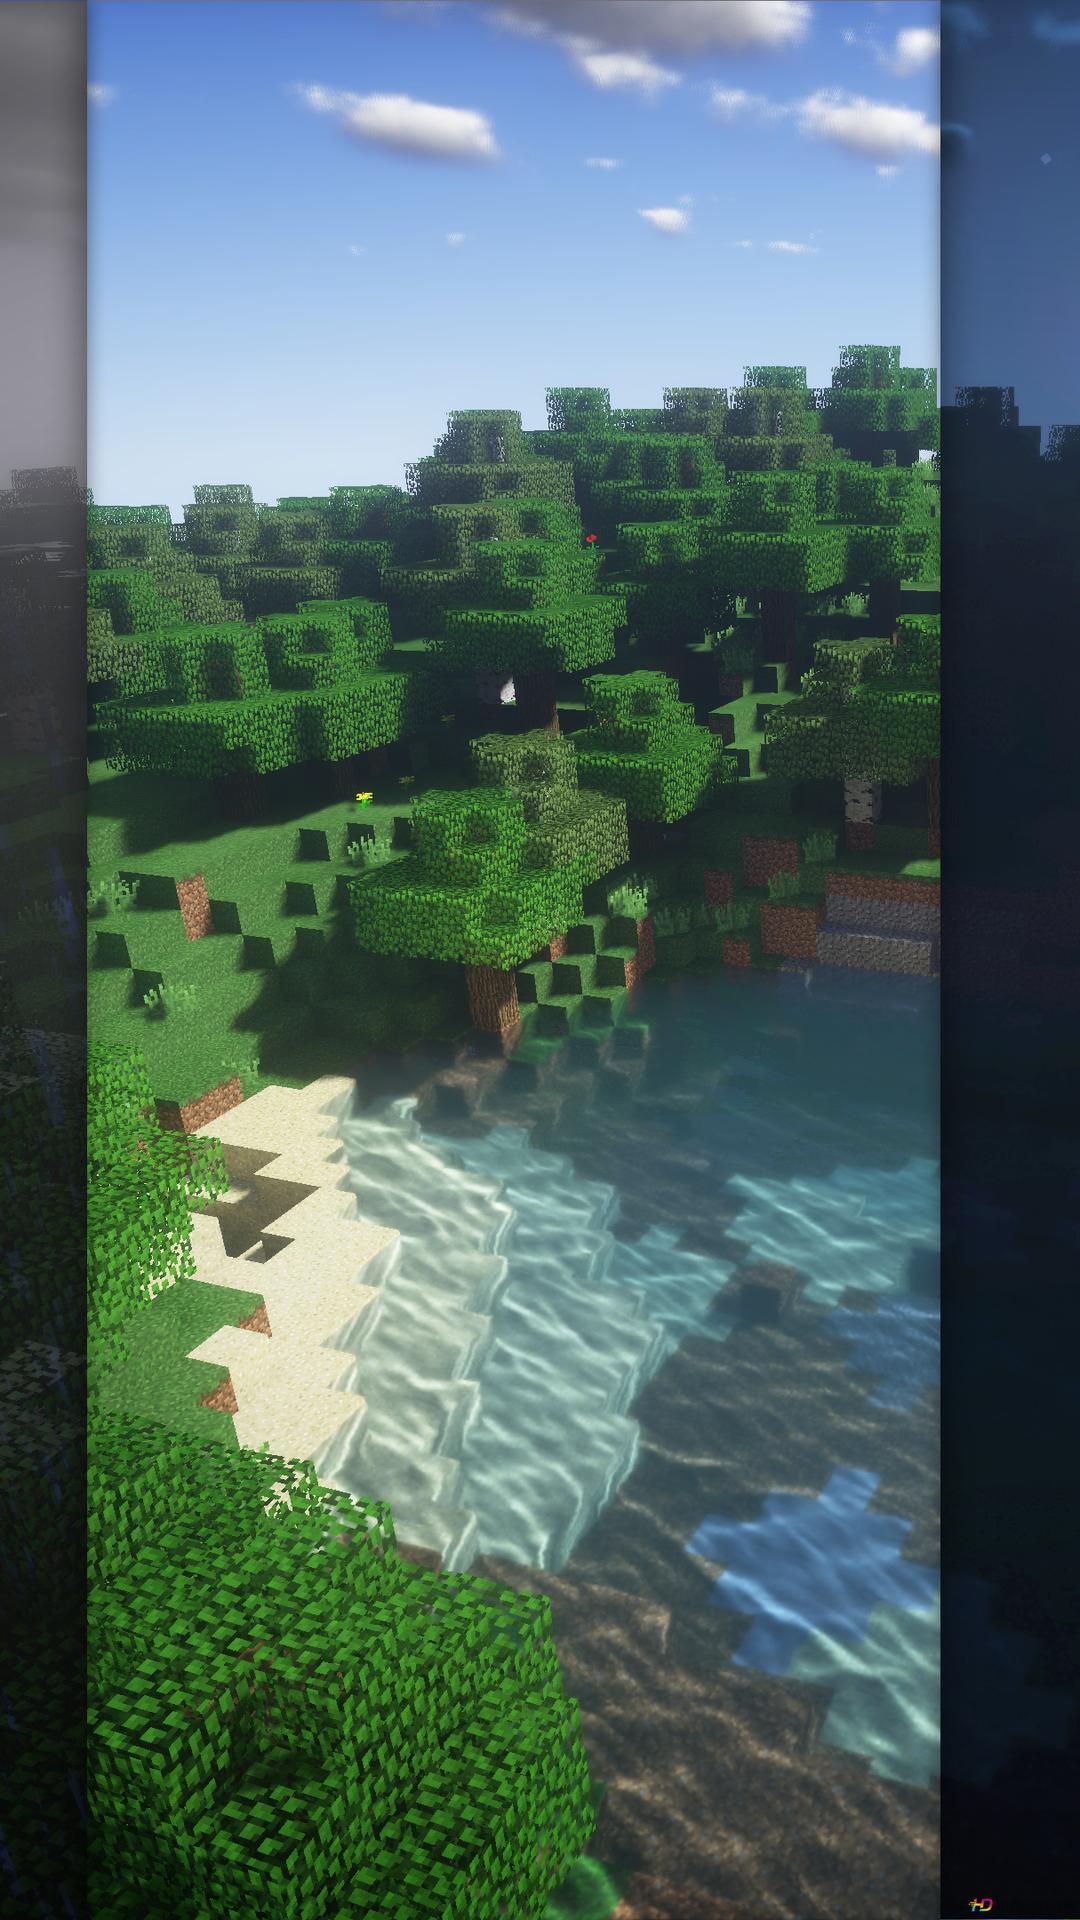 Fond D écran Minecraft Iphone